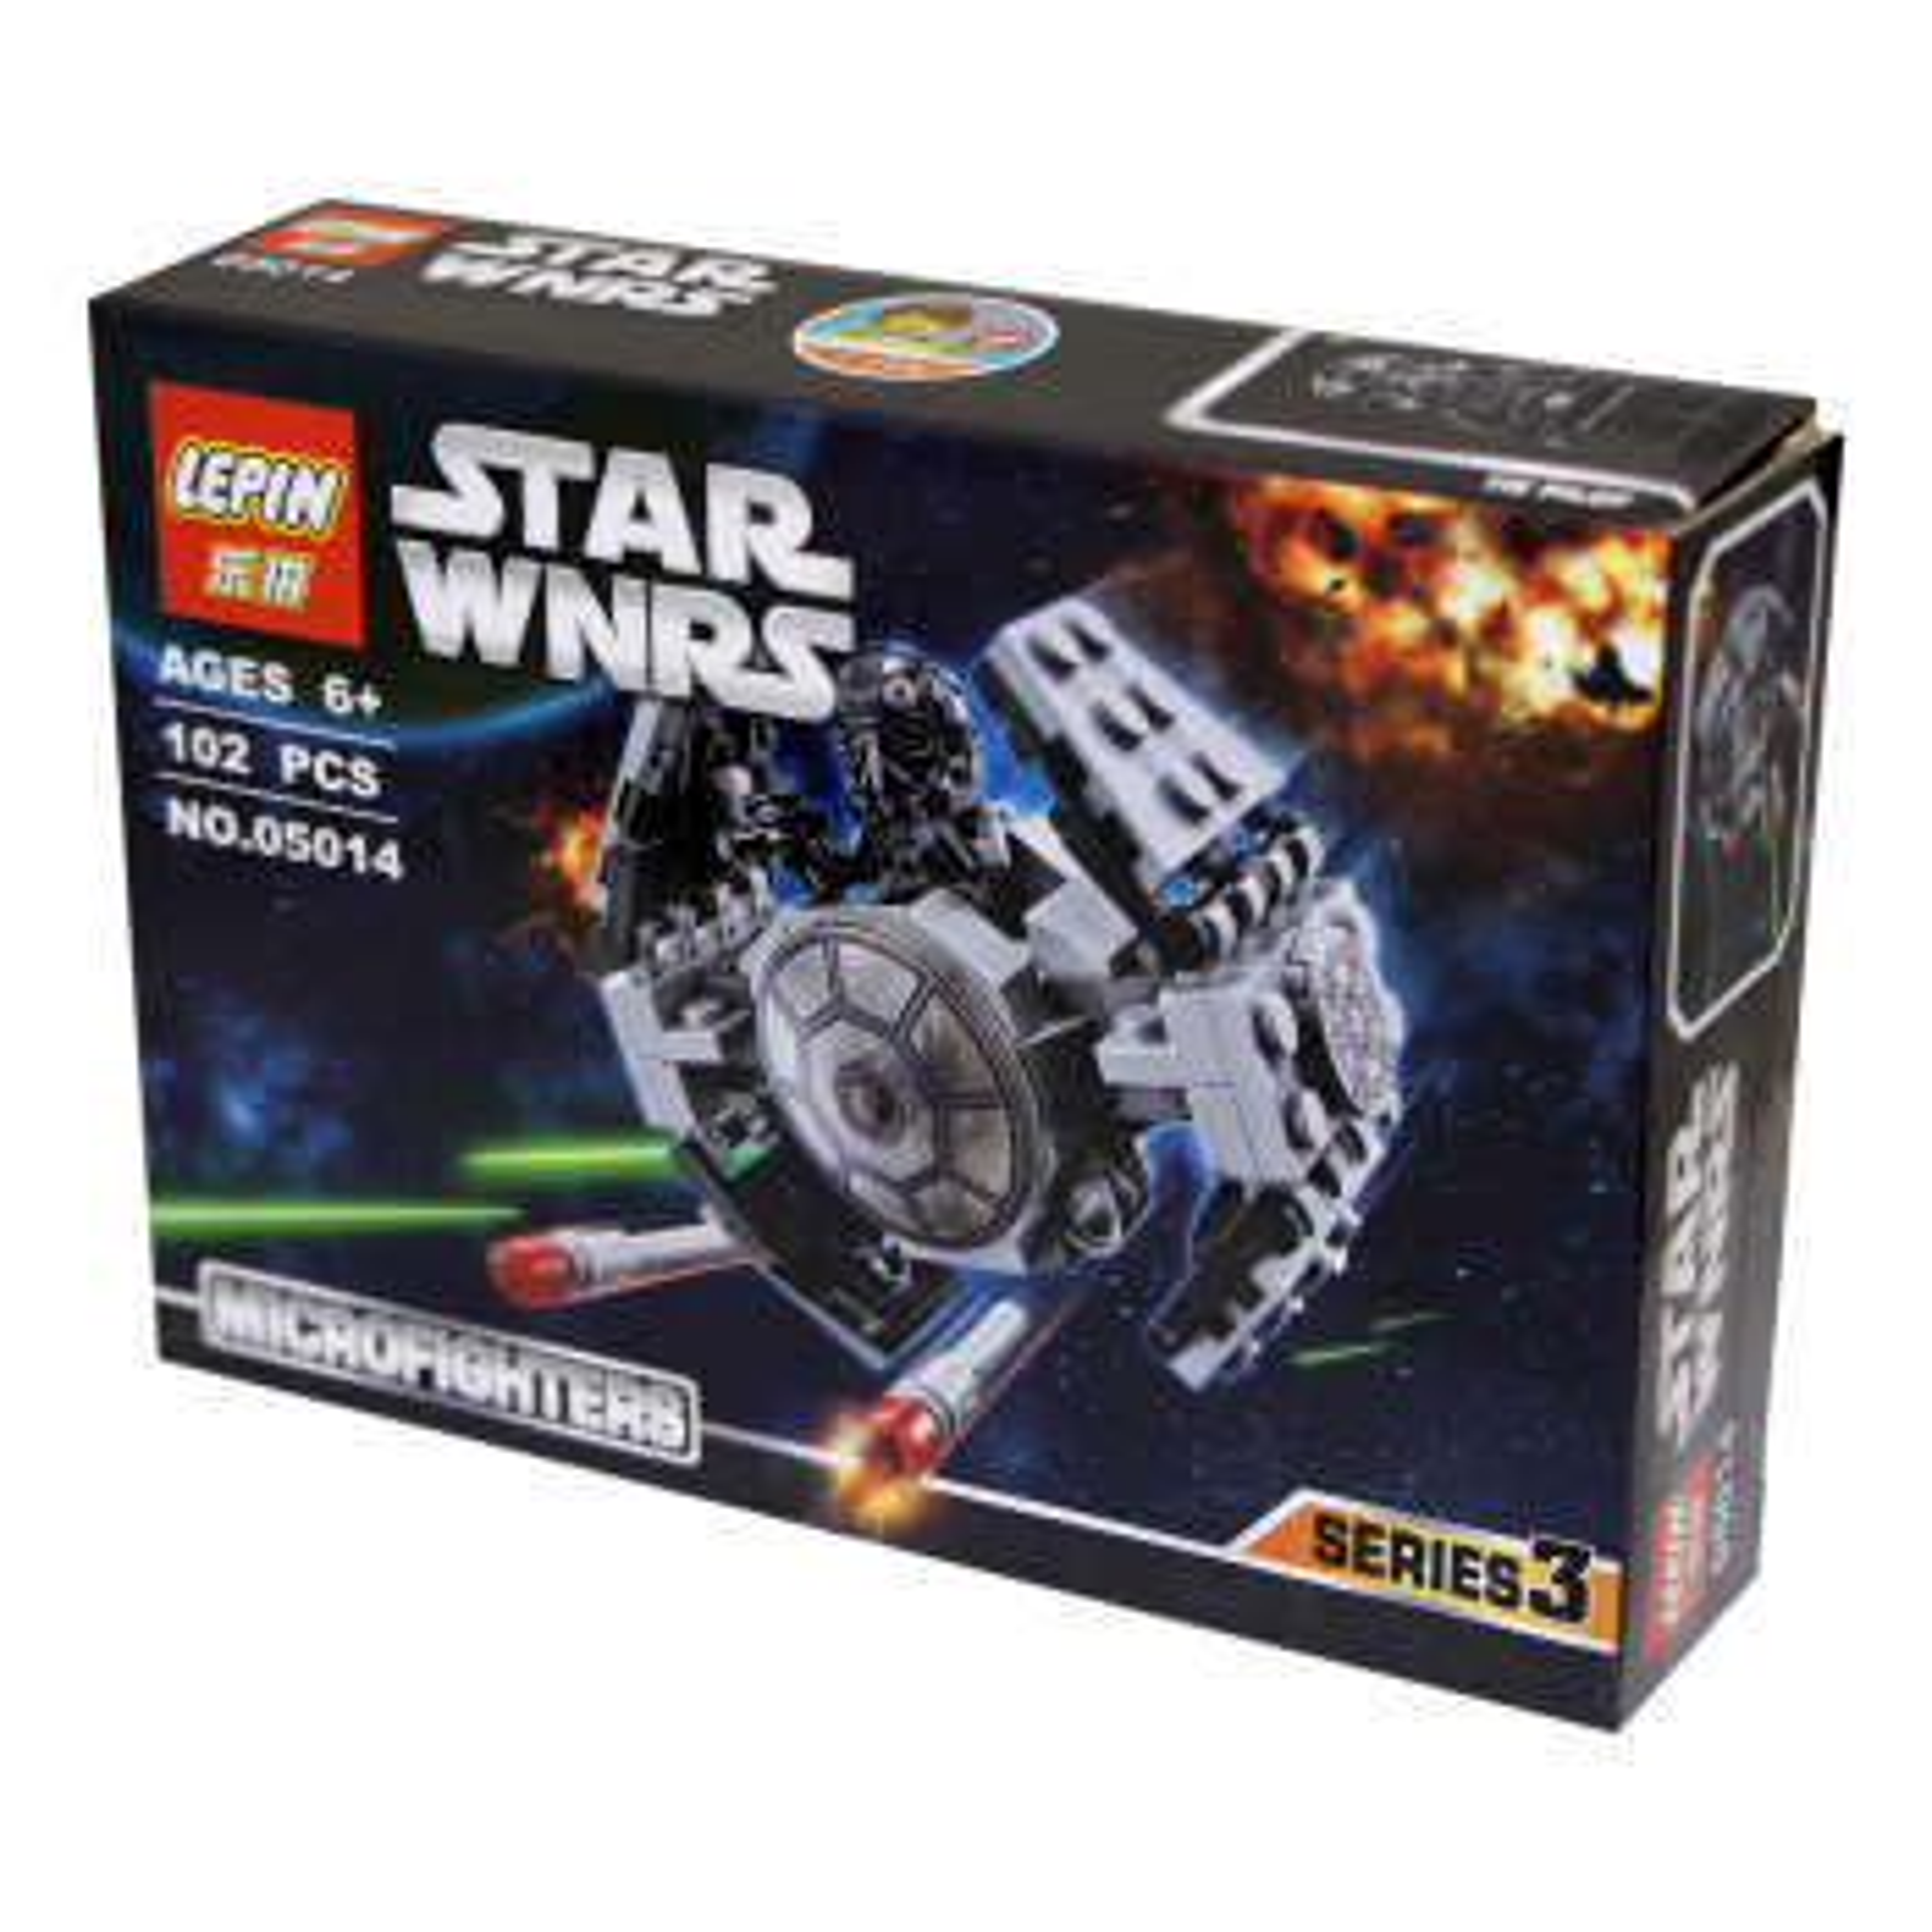 ساختنی لپین مدل Star Wars 05014